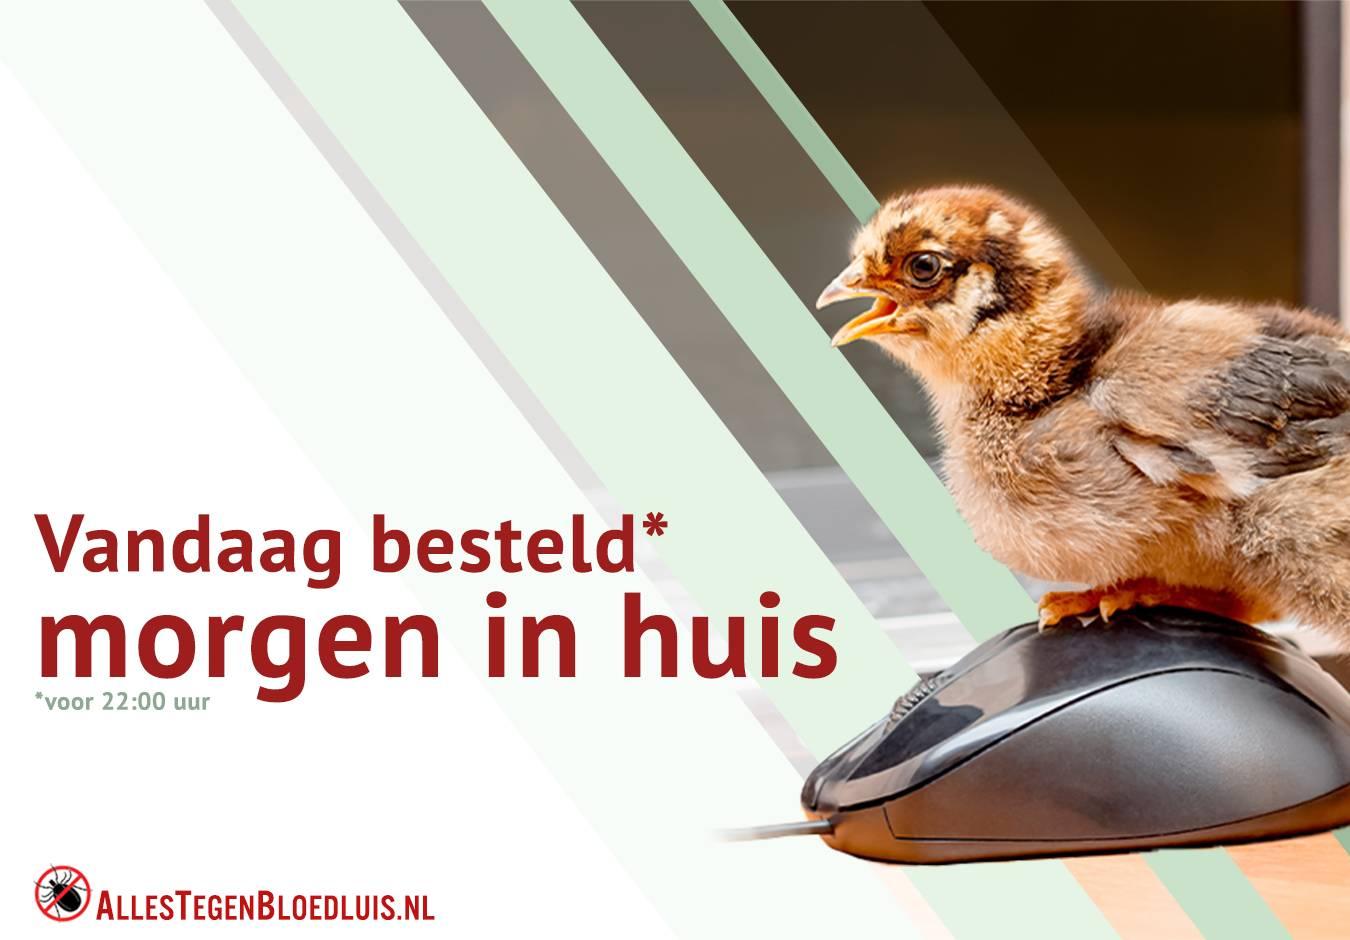 AllesTegenBloedluis.nl